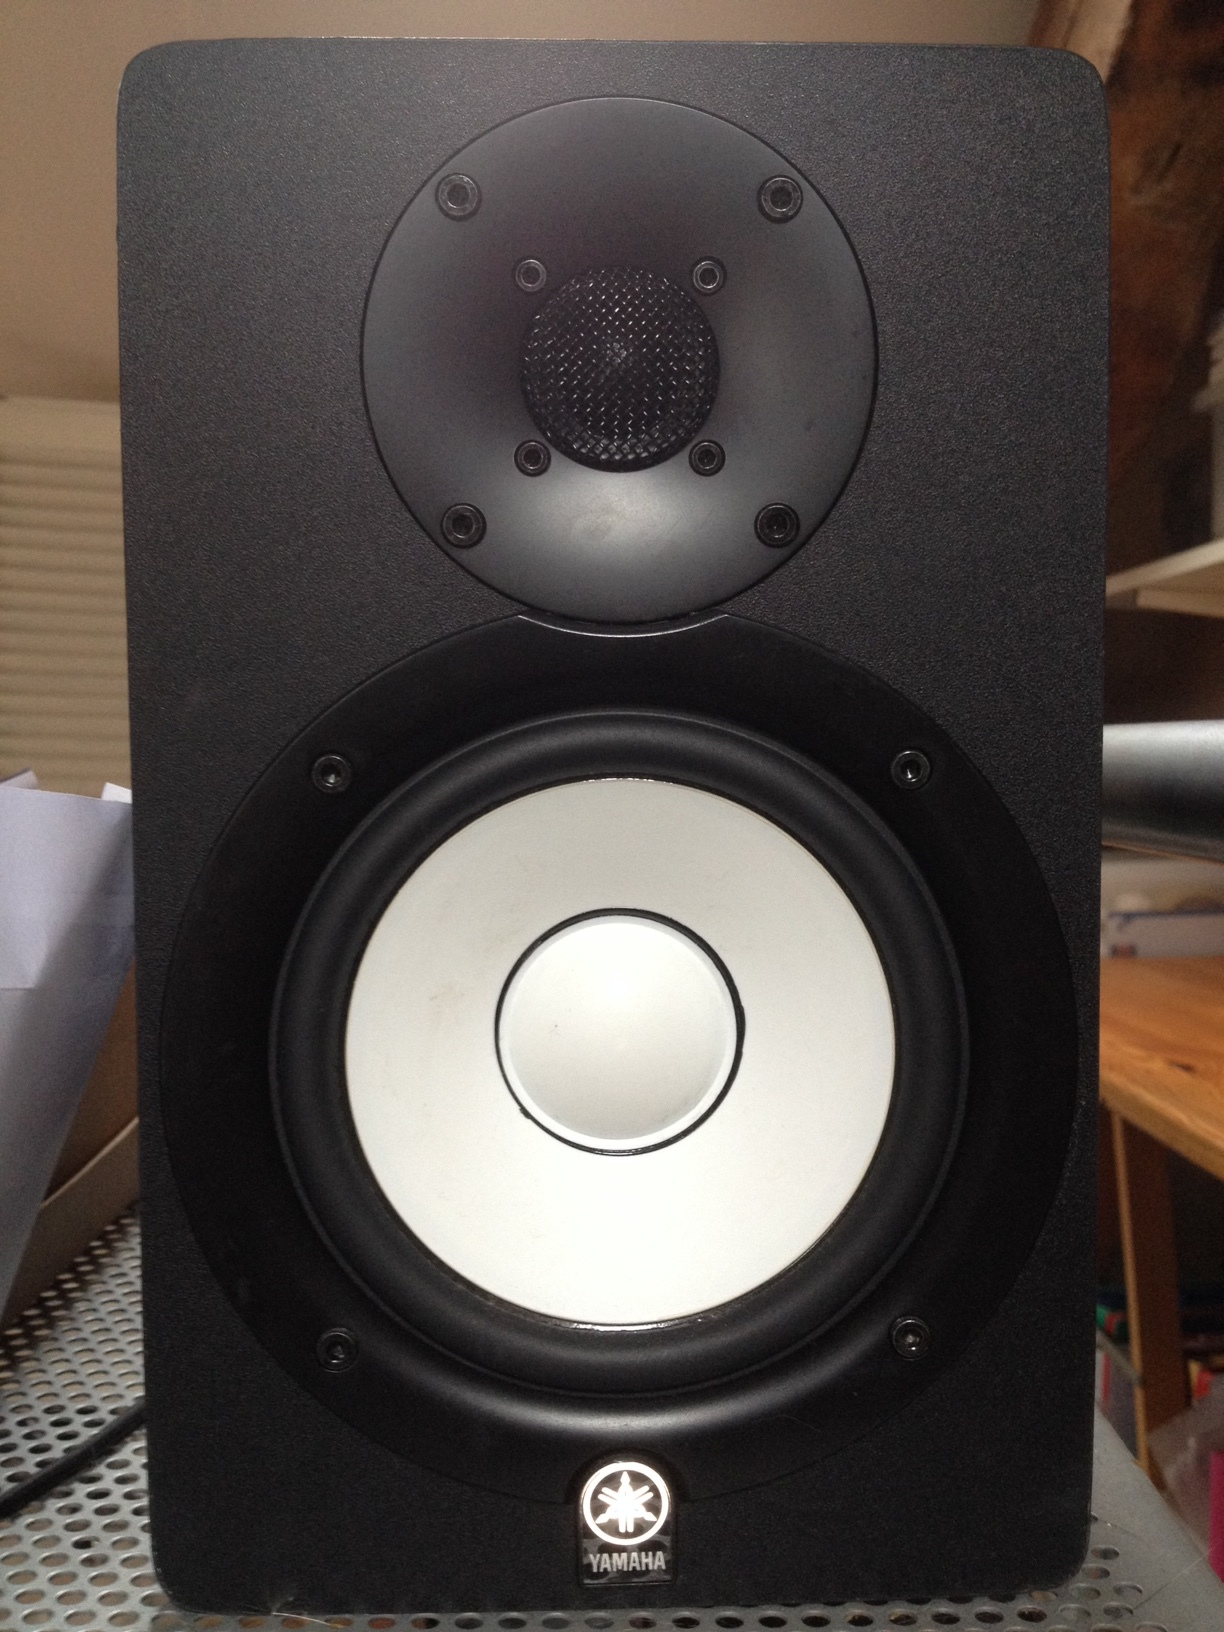 Yamaha hs50m image 1467283 audiofanzine for Yamaha hs50m review